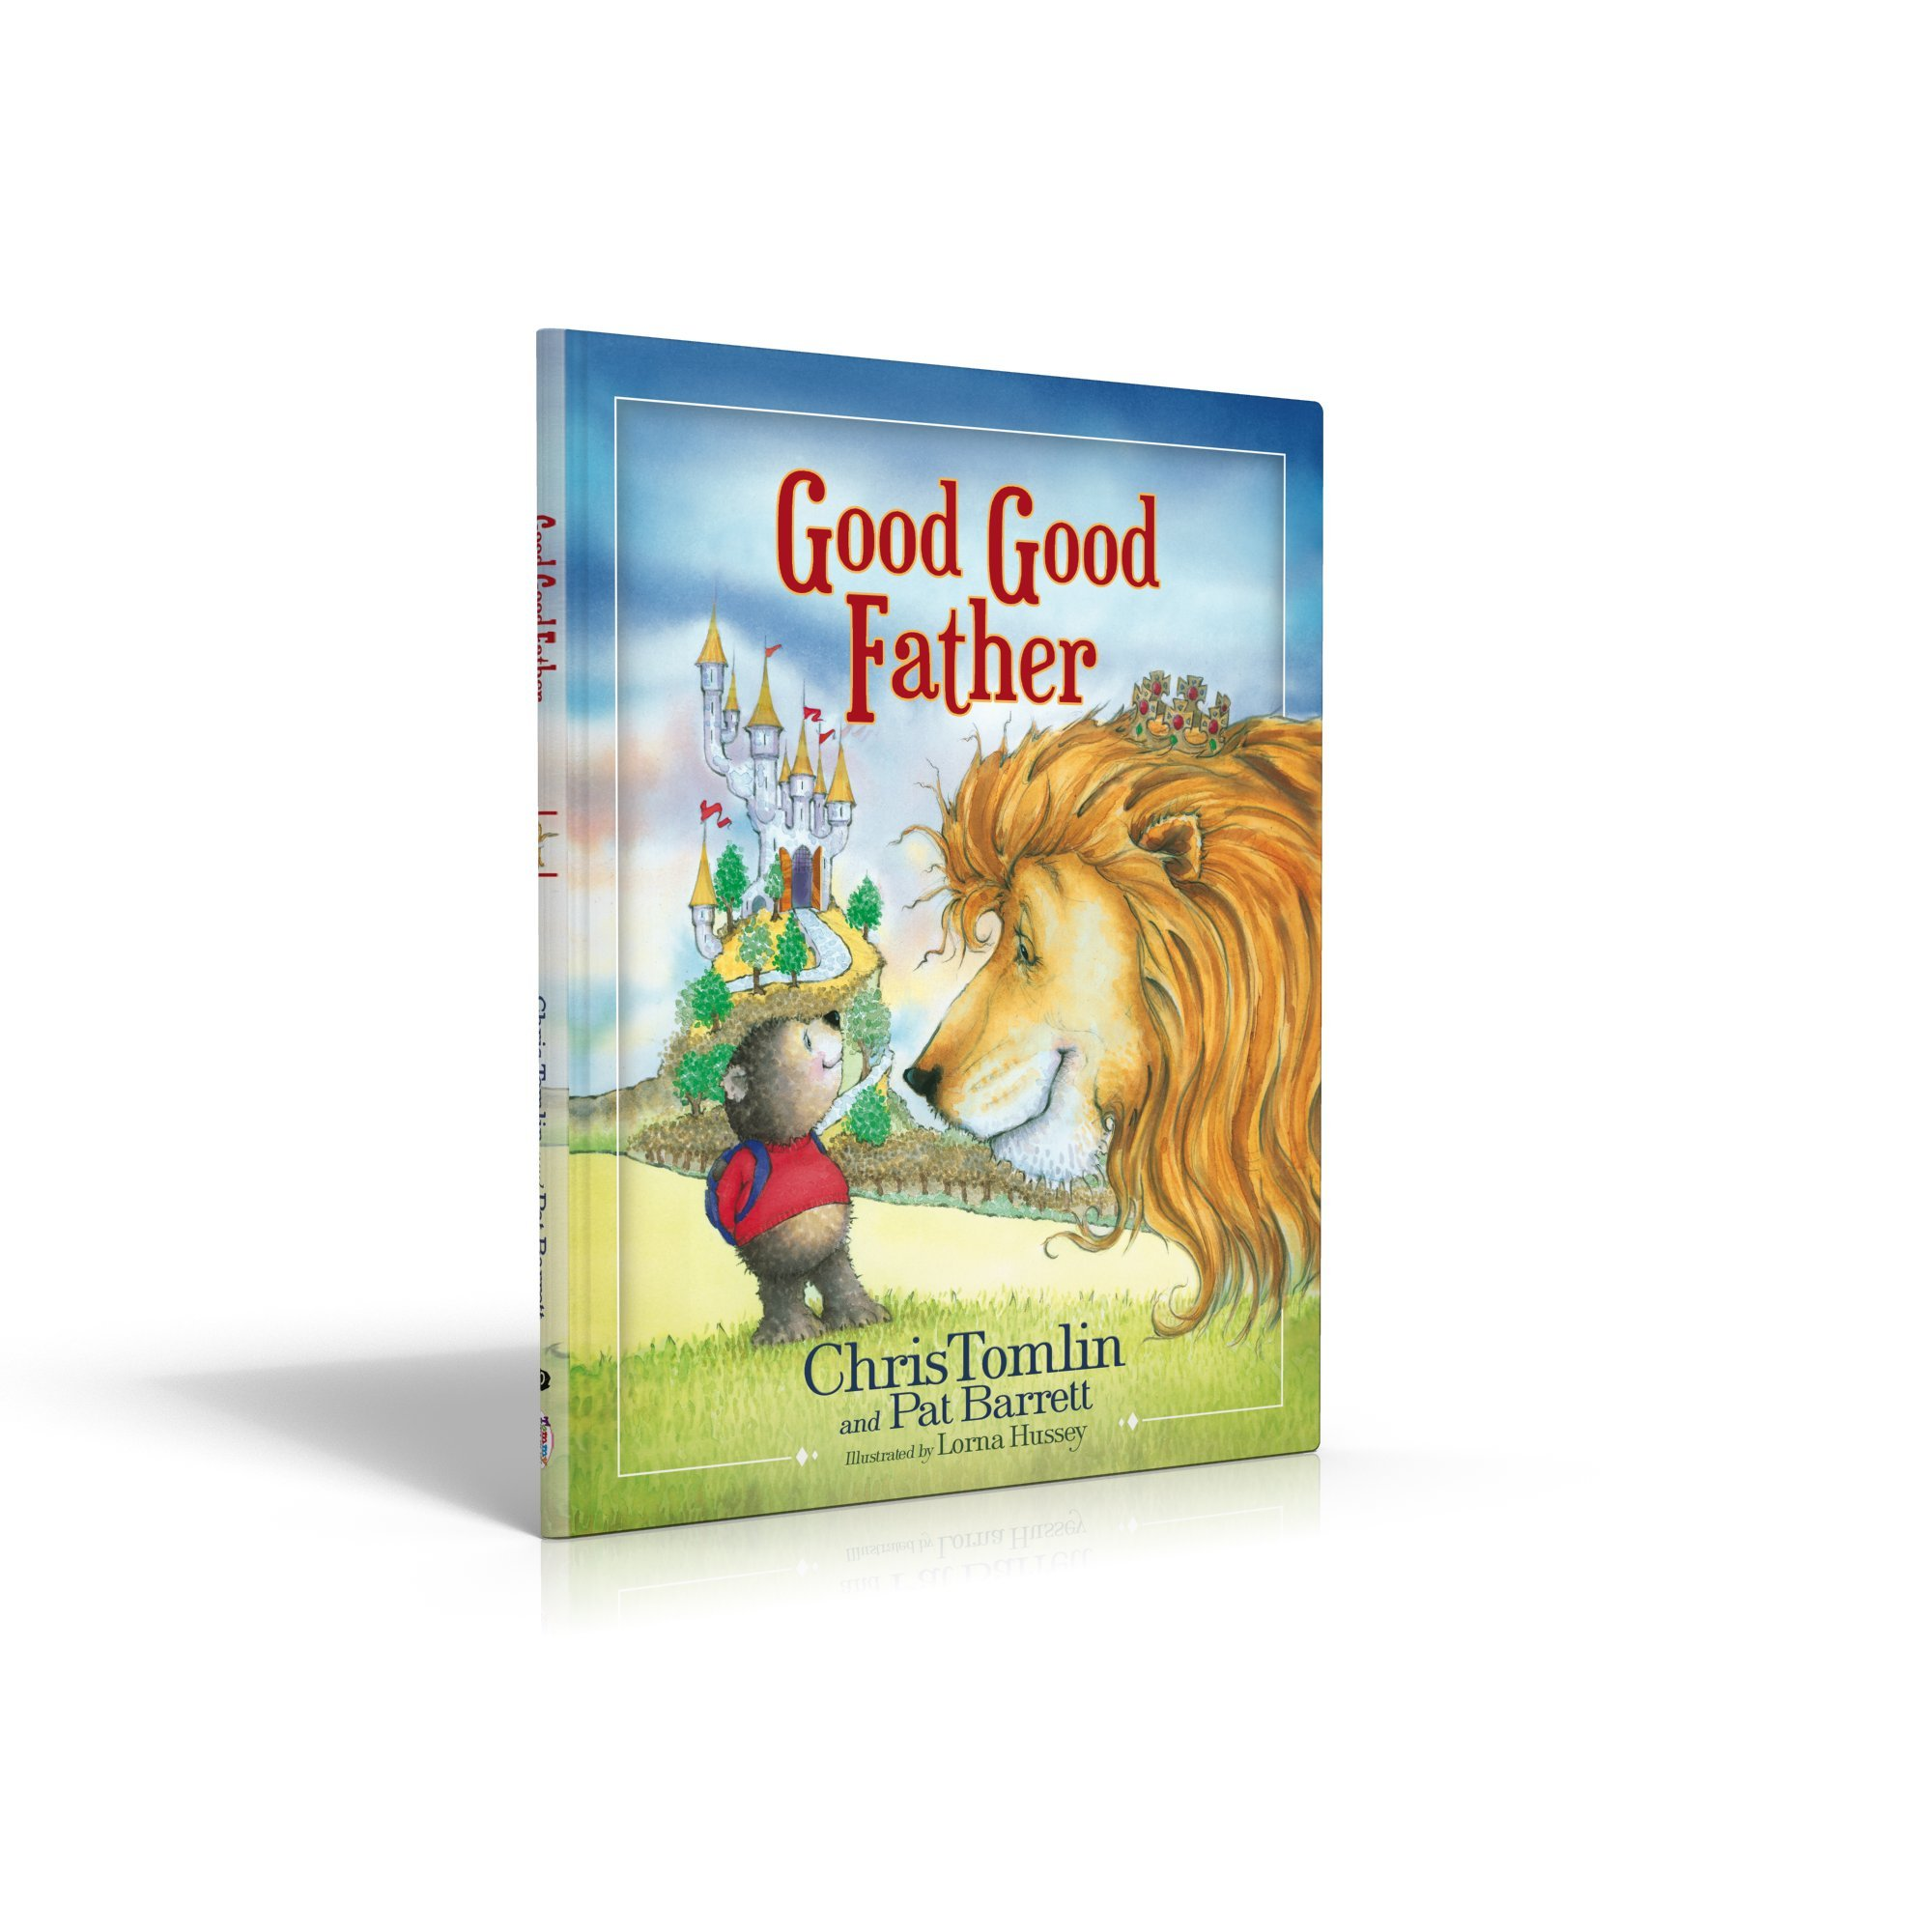 Amazon: Good Good Father (9780718086954): Chris Tomlin, Pat Barrett:  Books